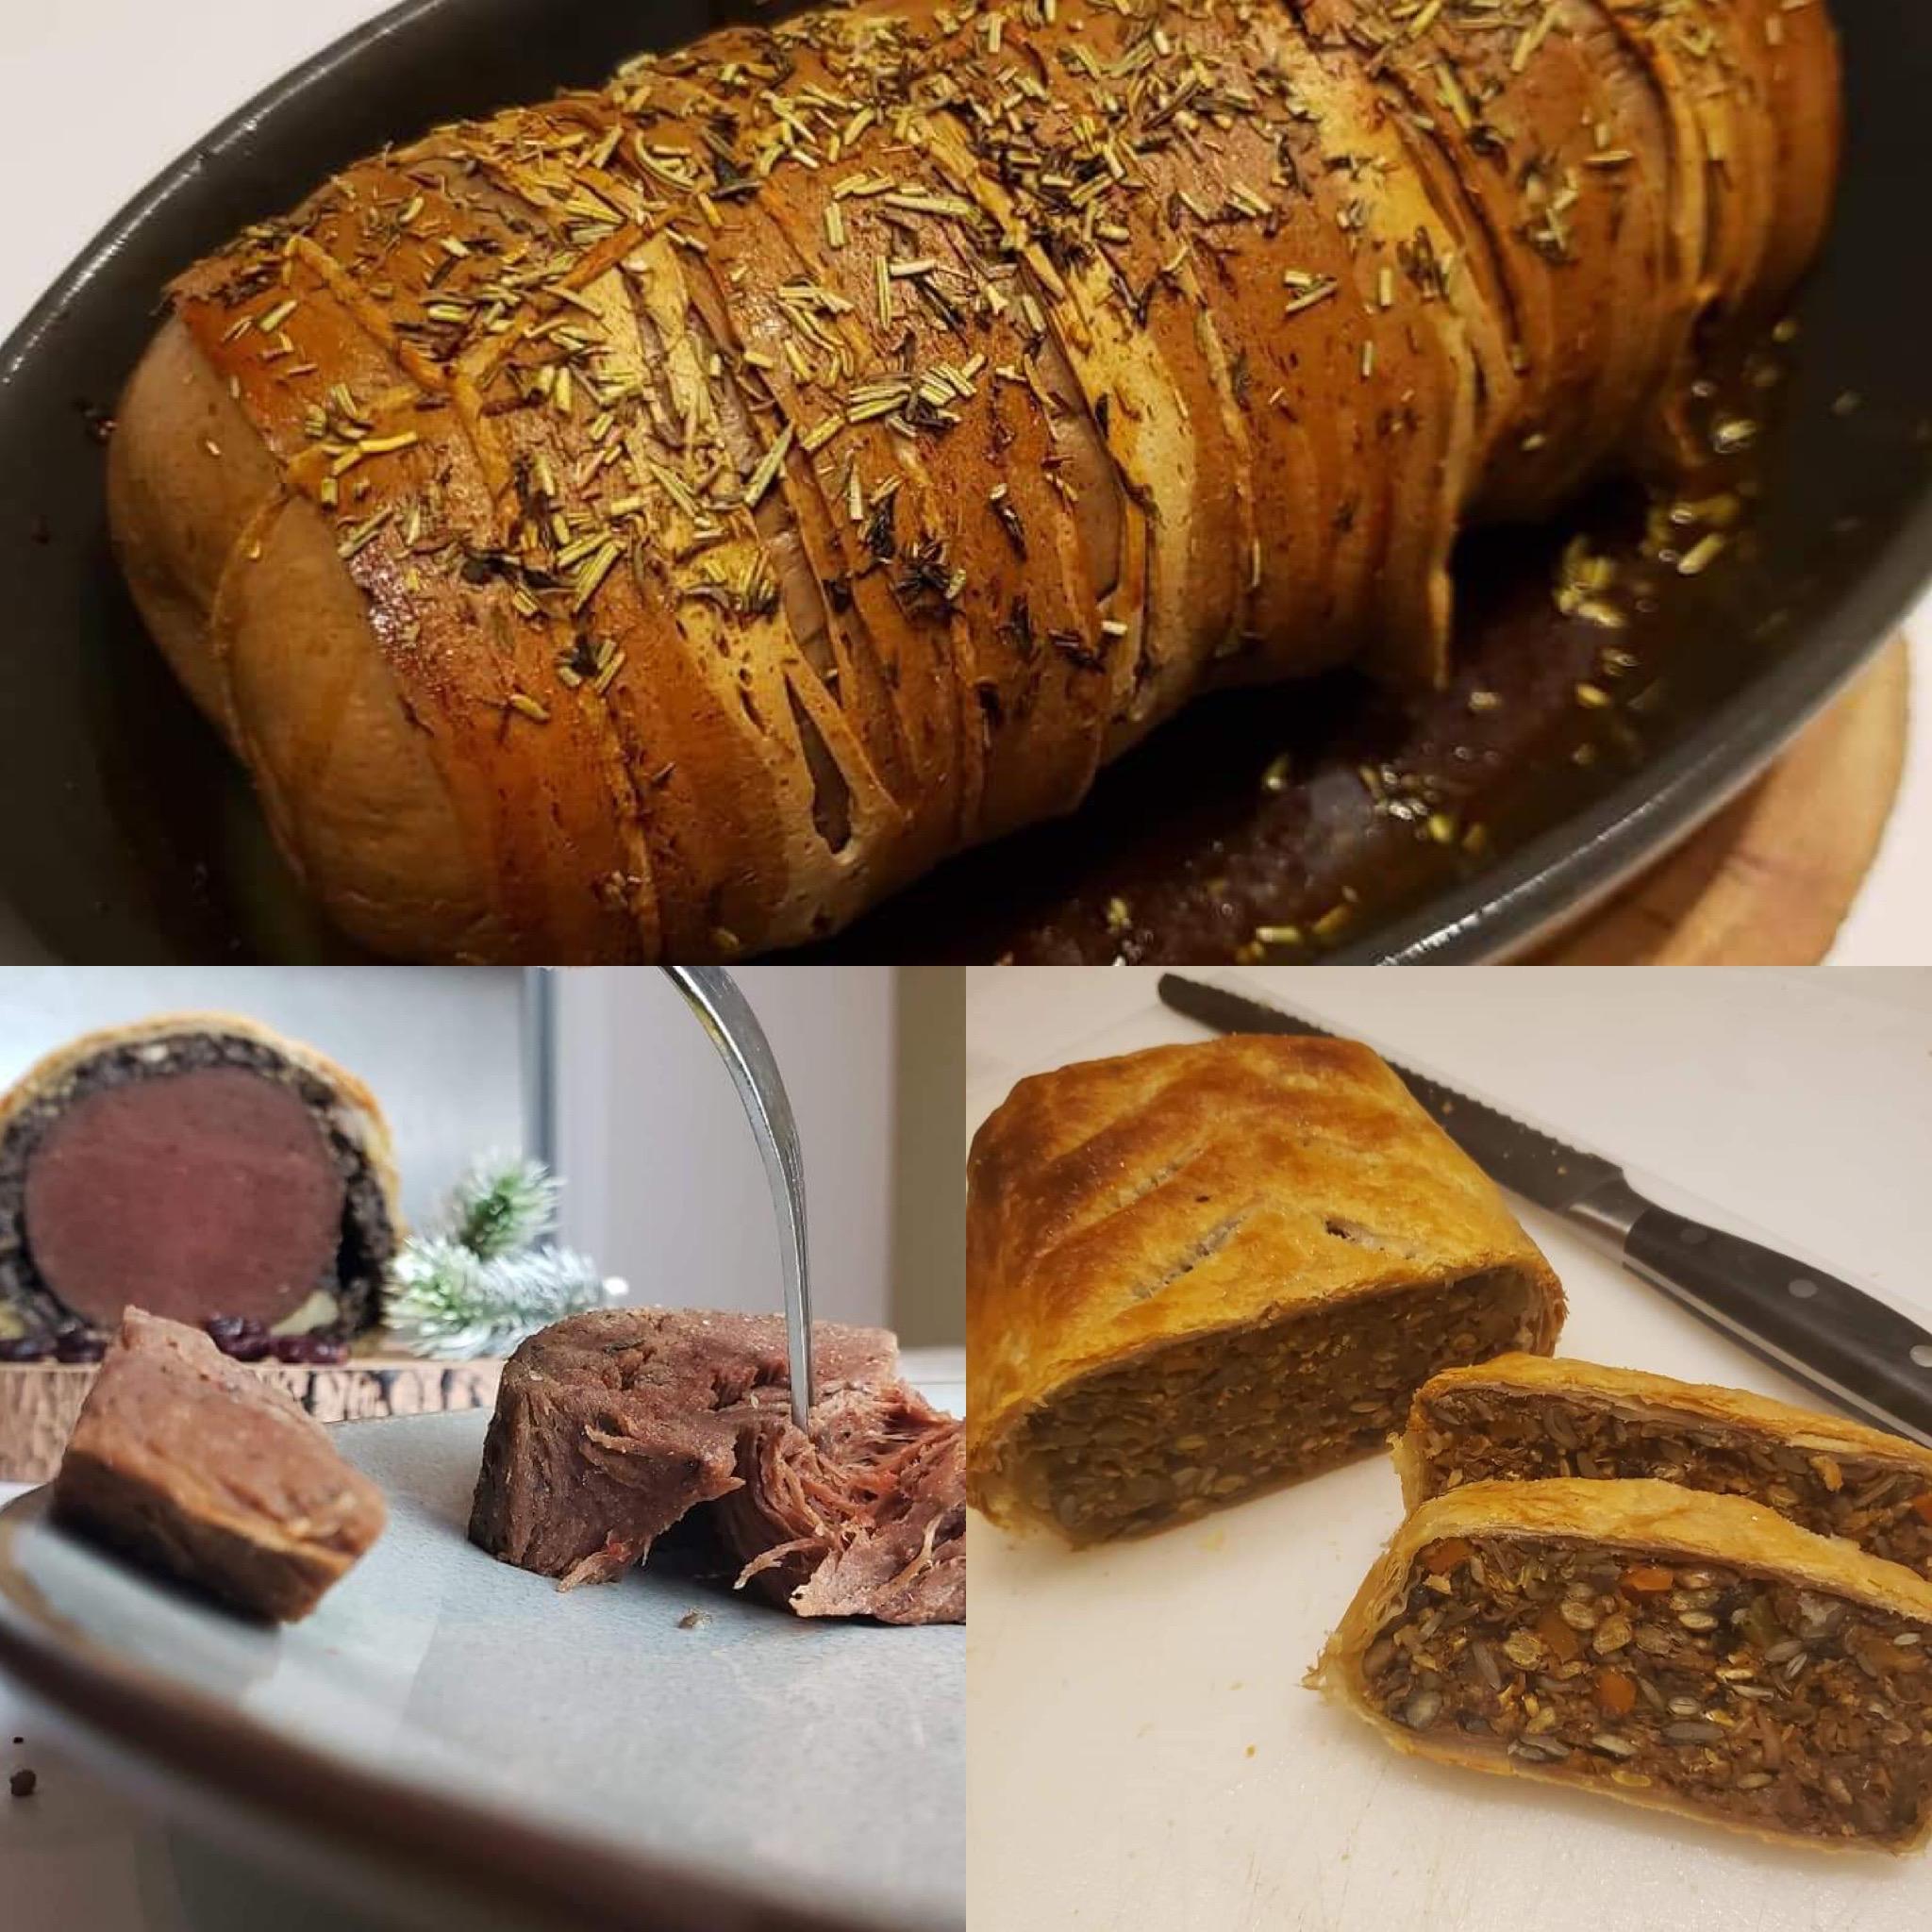 Image of vegan roasts